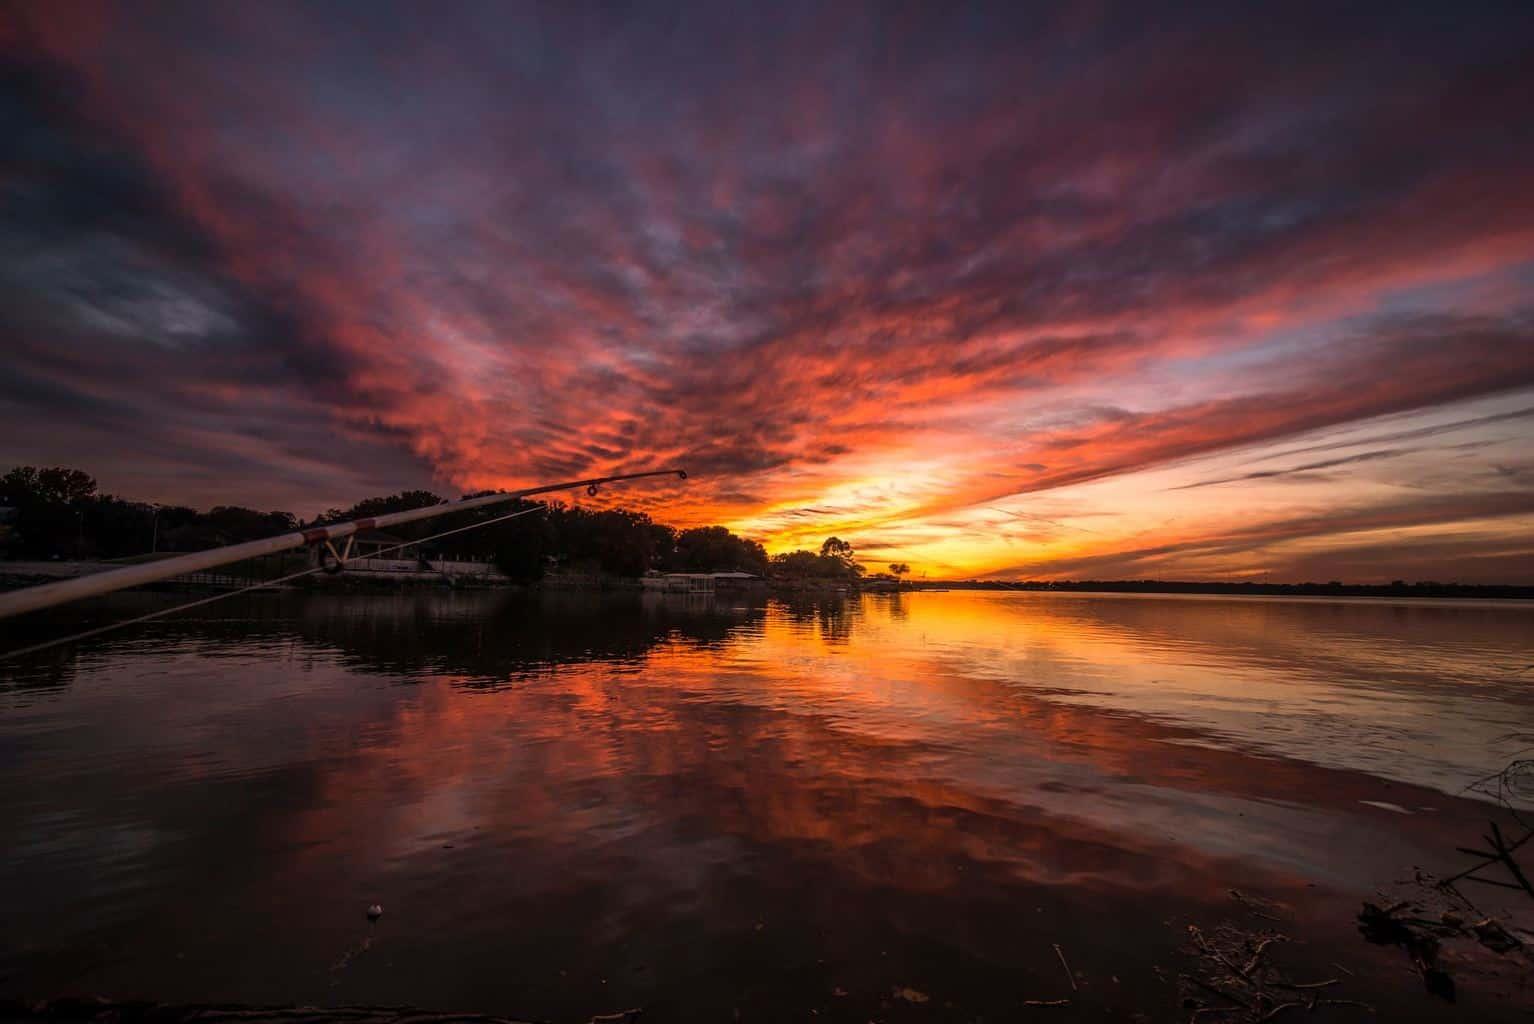 Sunset over Lake Arlington in Tx yesterday